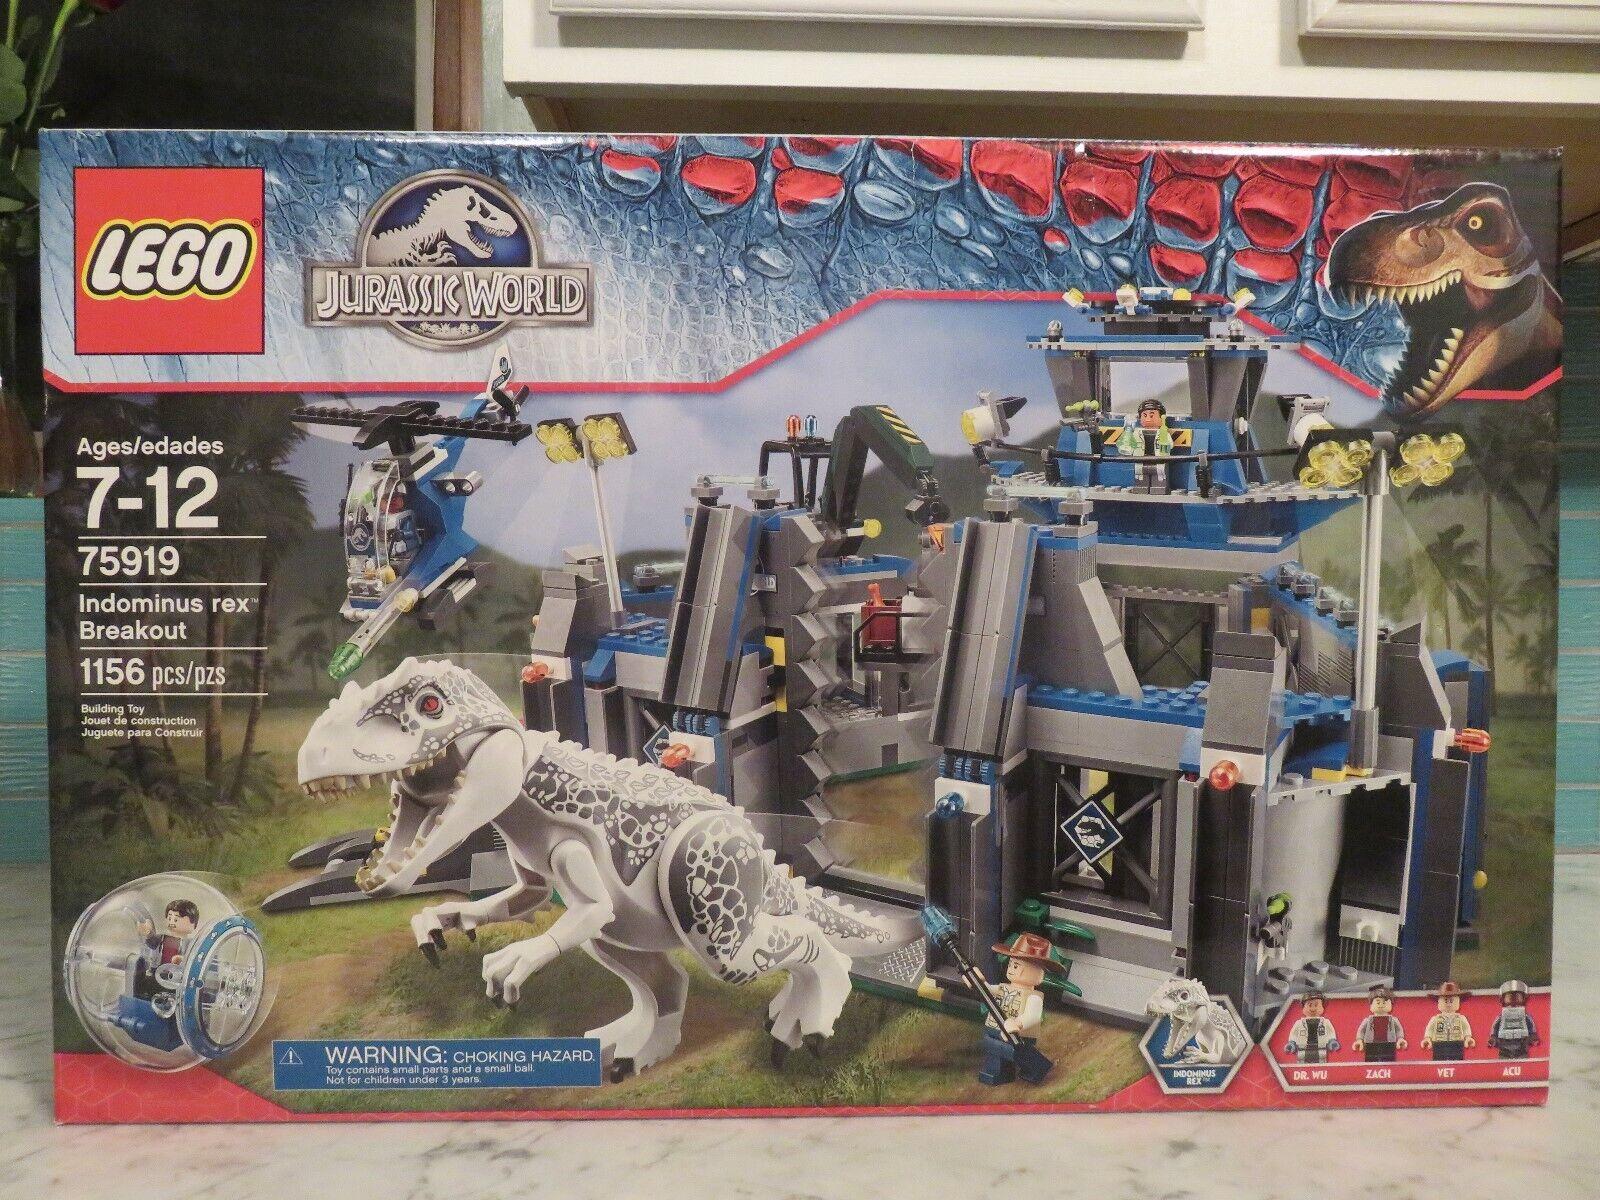 LEGO Jurassic World 75919 Indominus Rex Breakout, New, Sealed